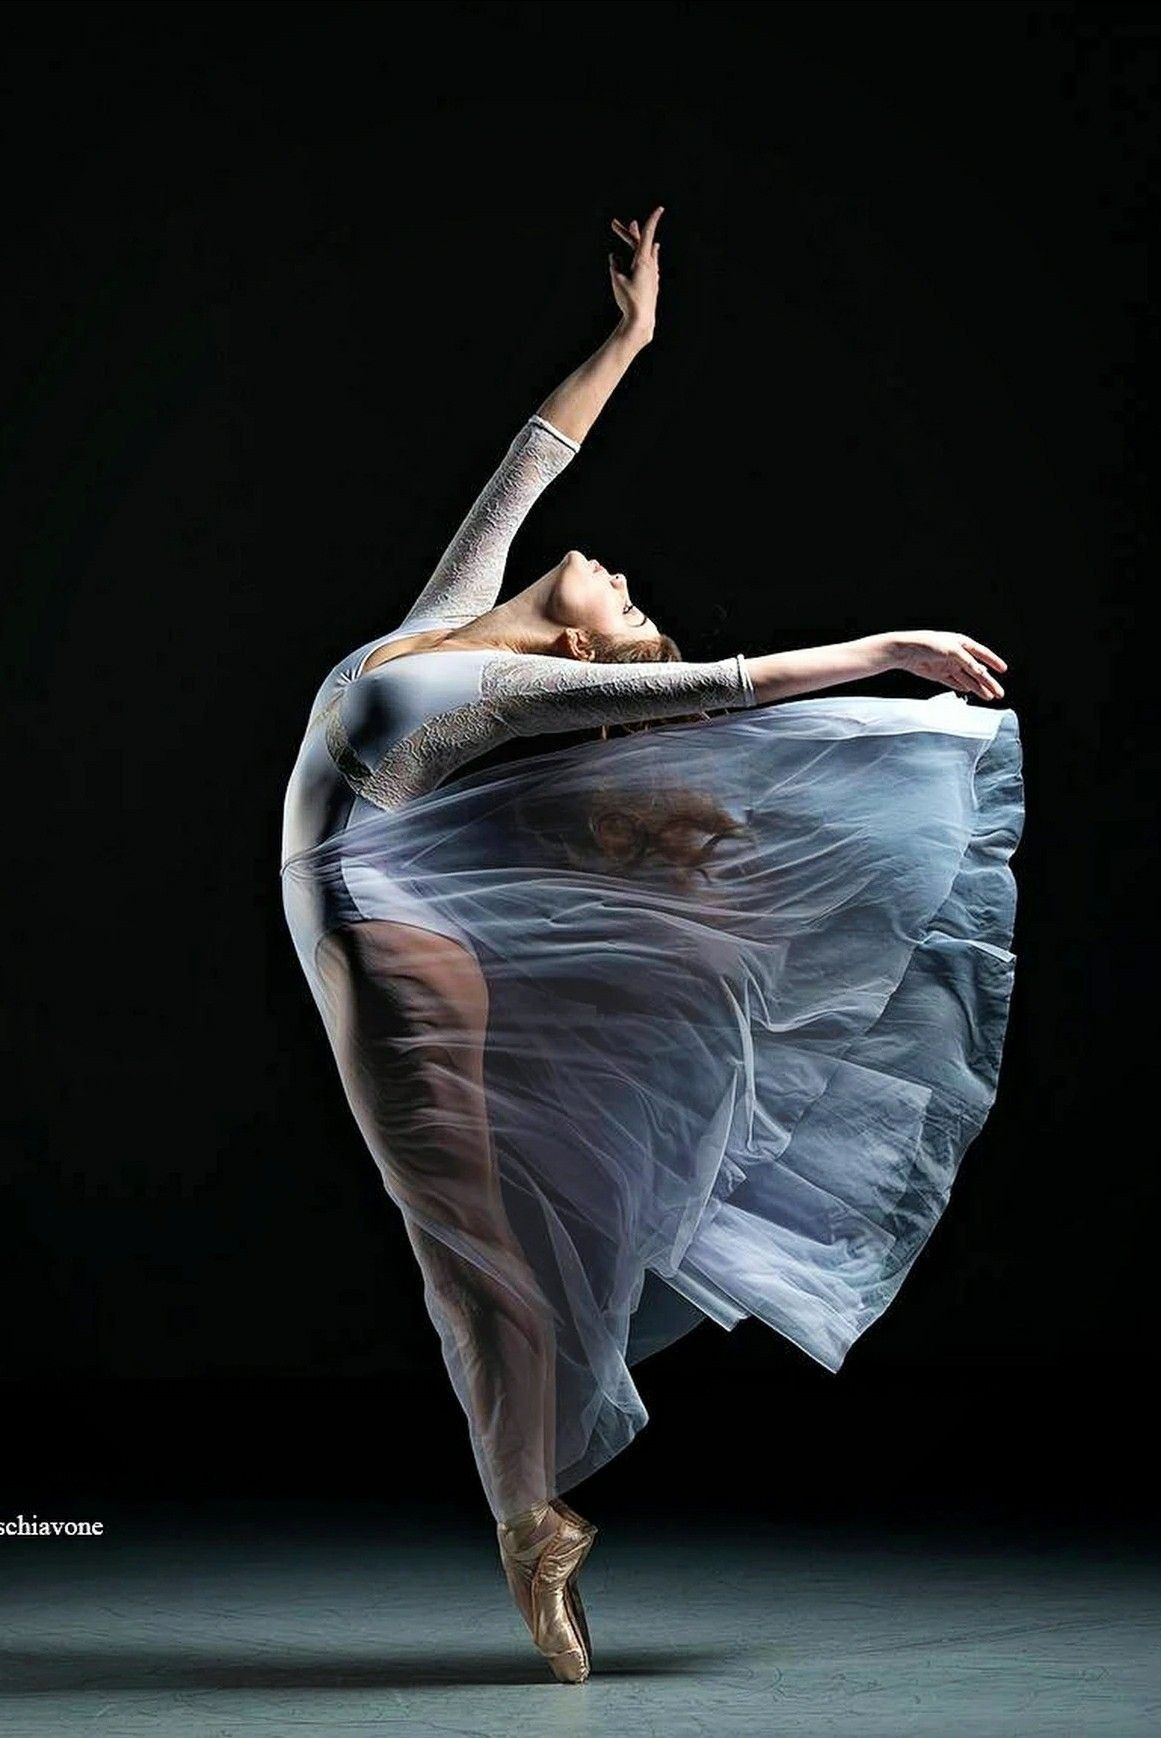 Pin By Eva Magdalena Bilek On Elegance Of Dancers Dance Poses Dancer Photography Dance Art